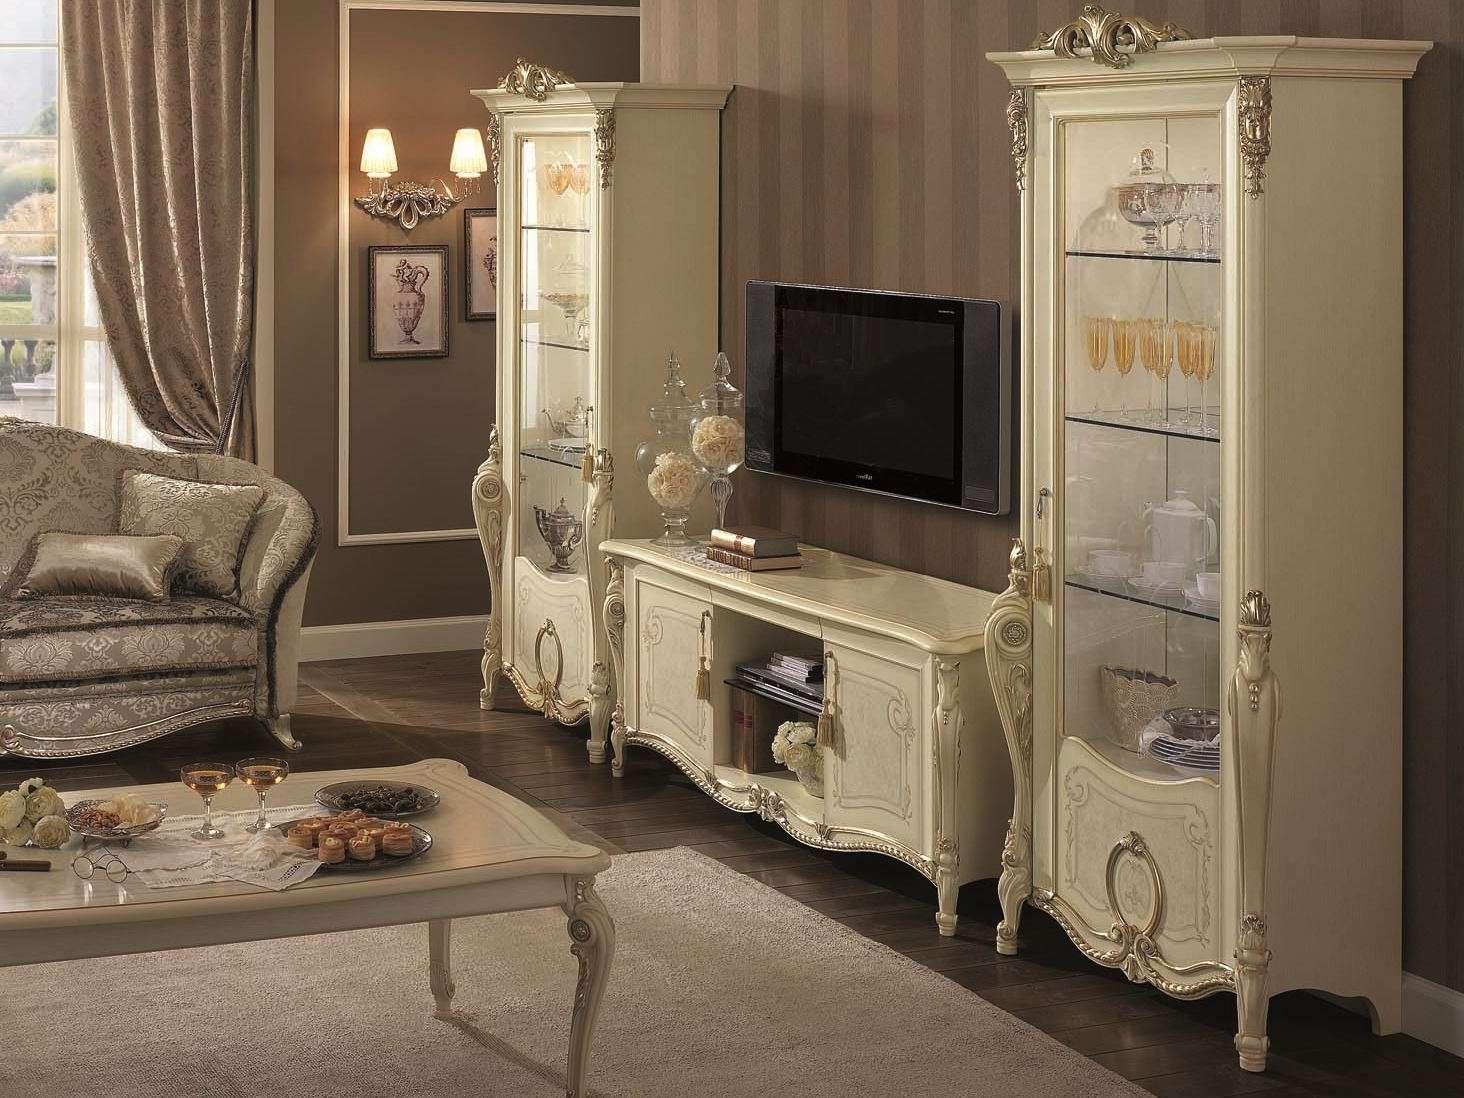 Mirò | Tv Cabinetarredoclassic Regarding Classic Tv Cabinets (View 4 of 20)